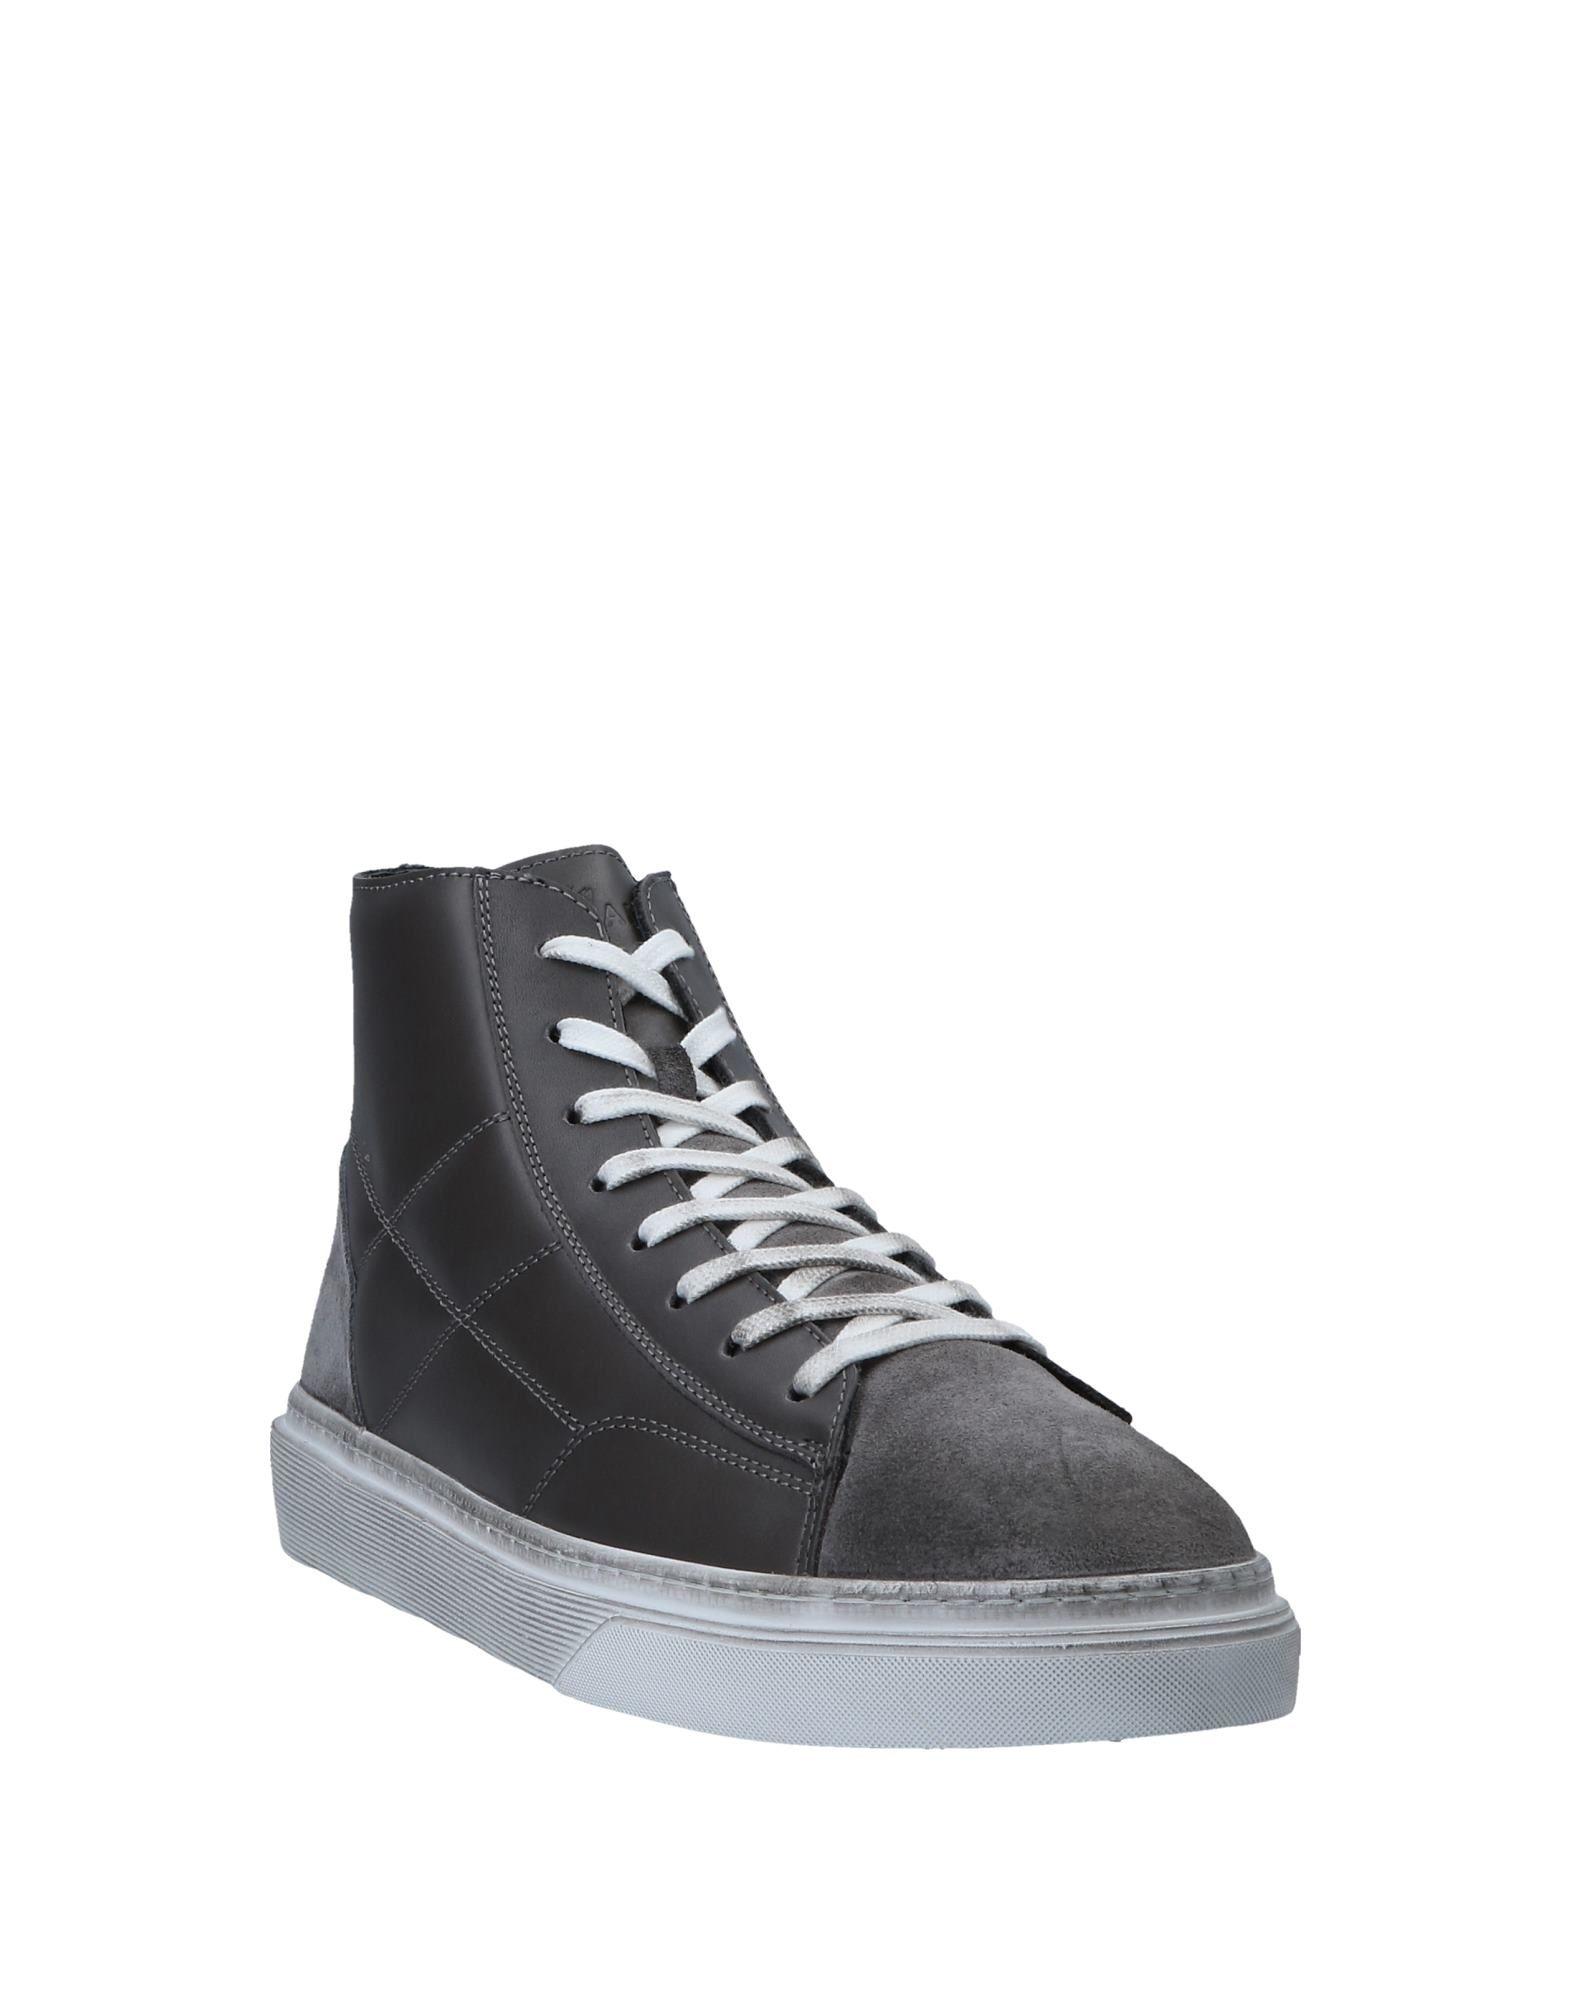 Hogan Sneakers Qualität Herren  11559623EE Gute Qualität Sneakers beliebte Schuhe 31e615